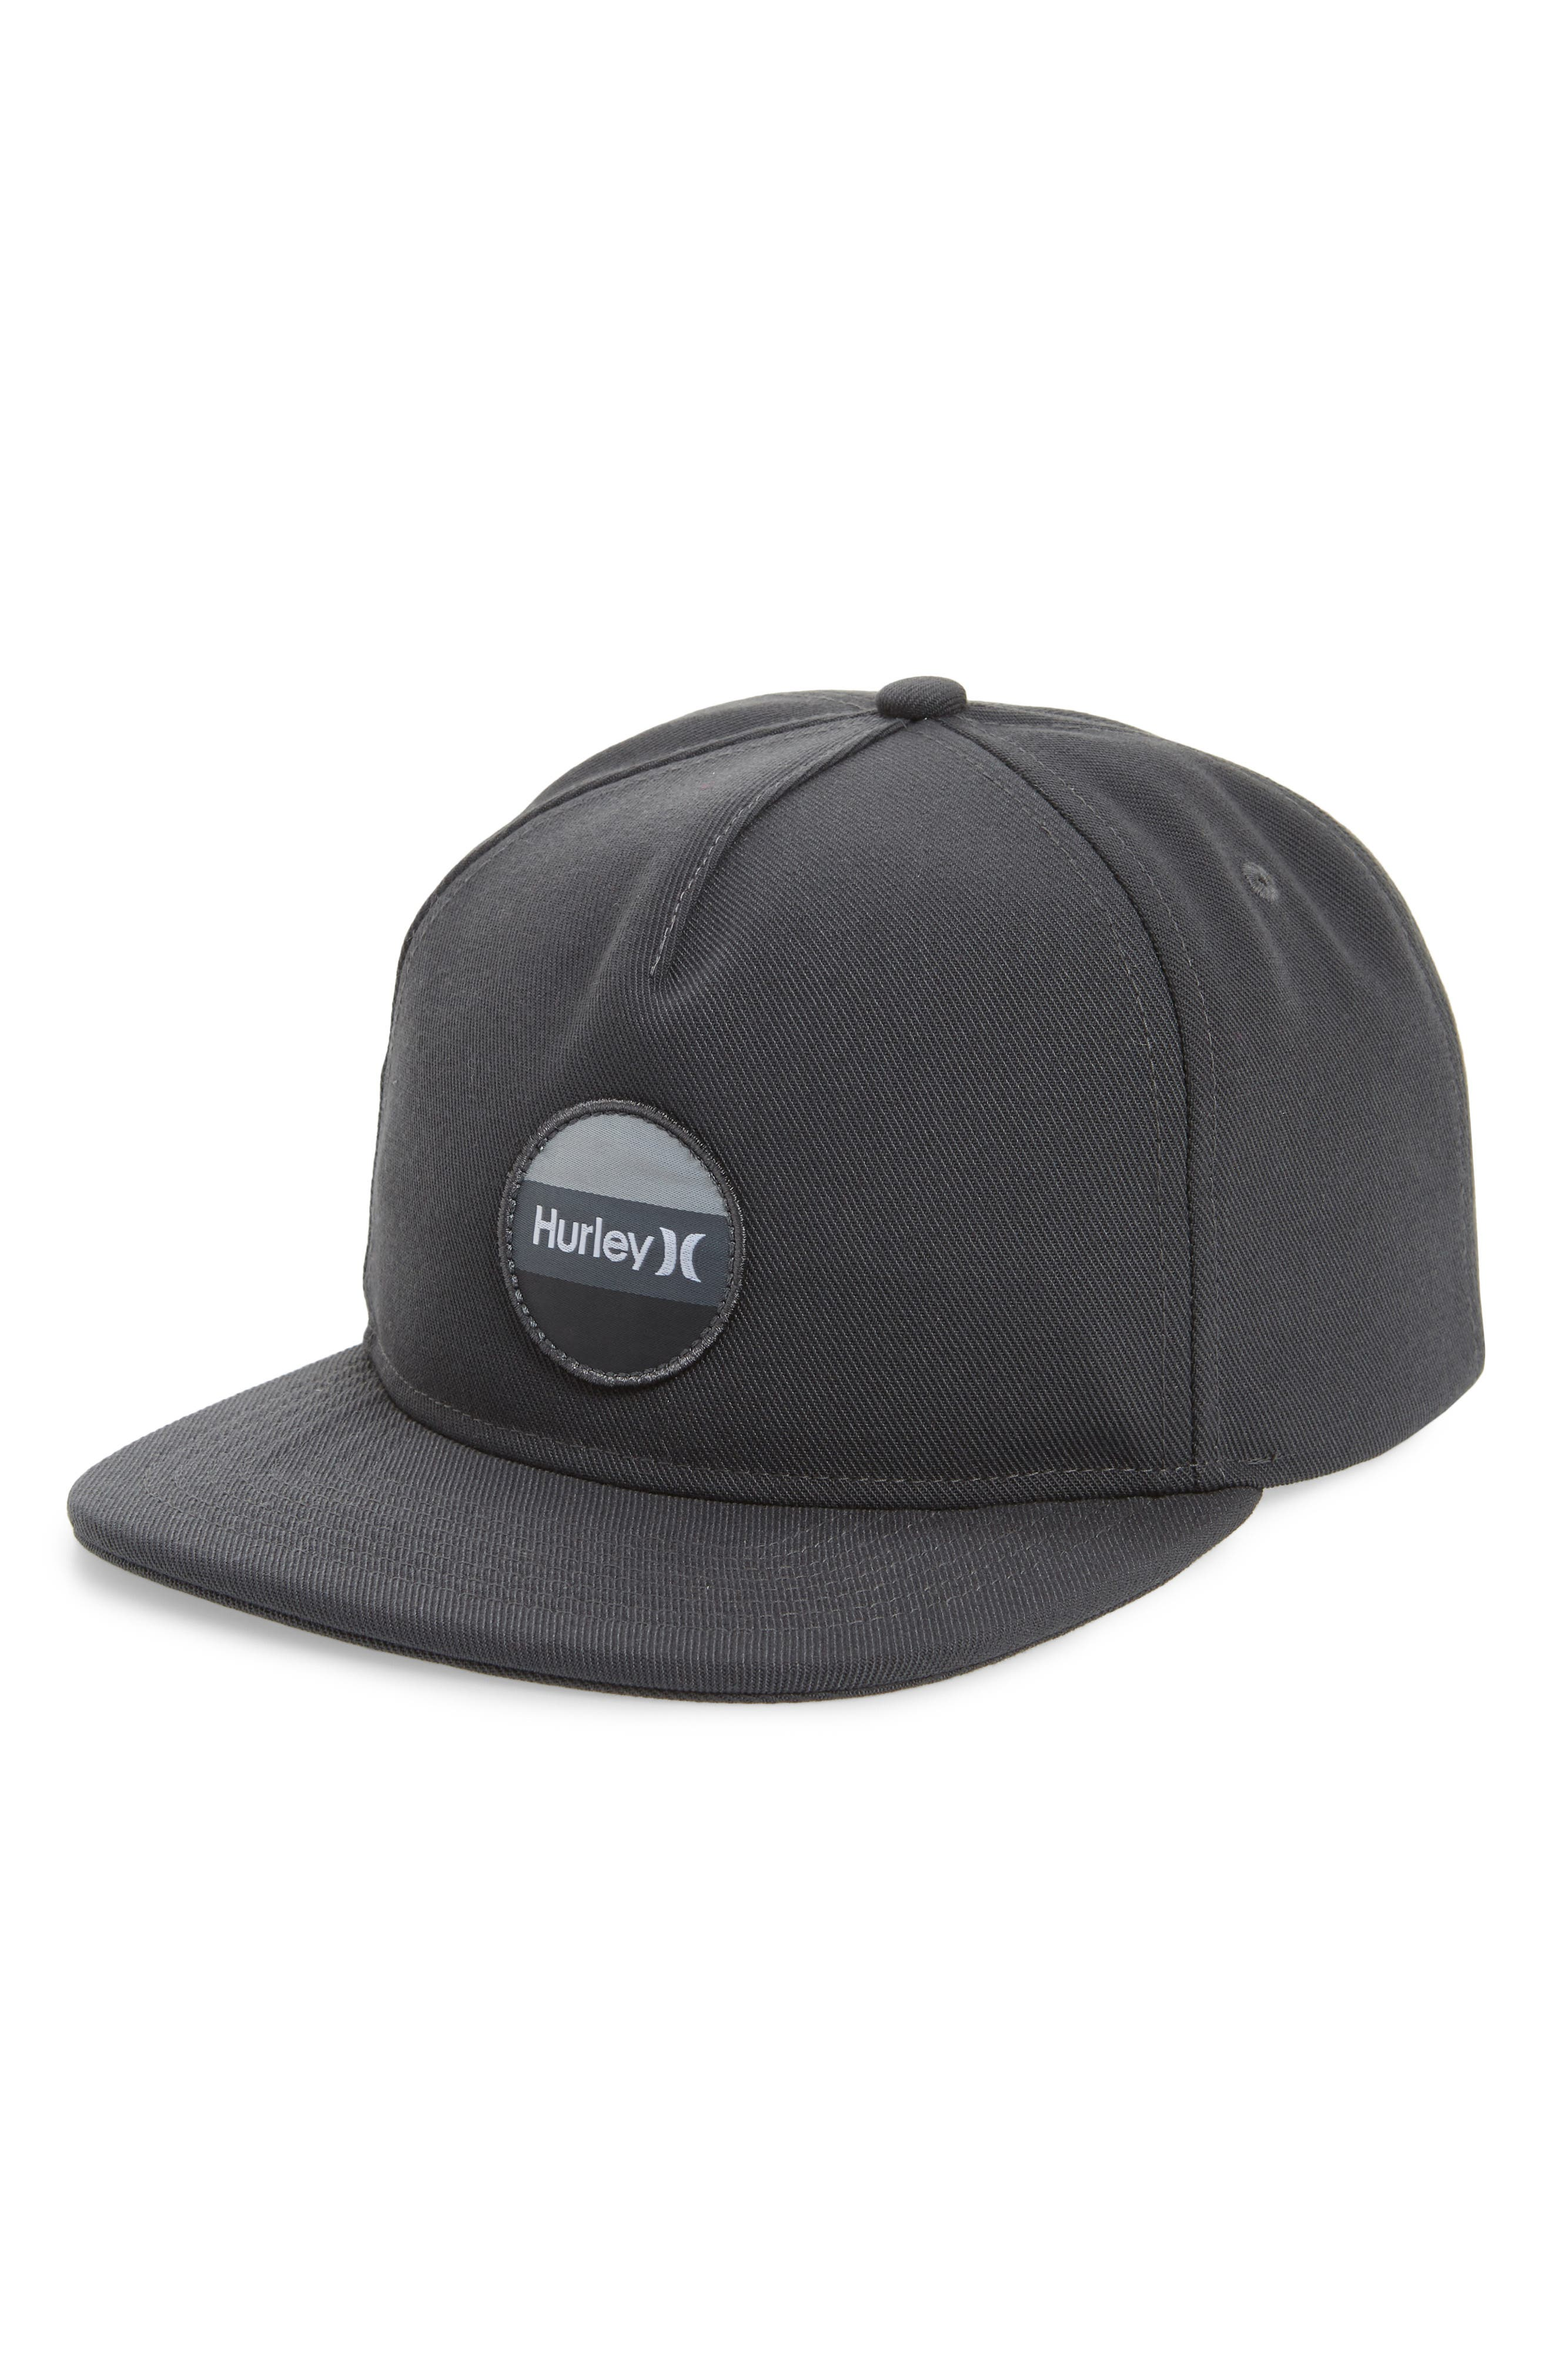 Hurley Circular Logo Patch Hat